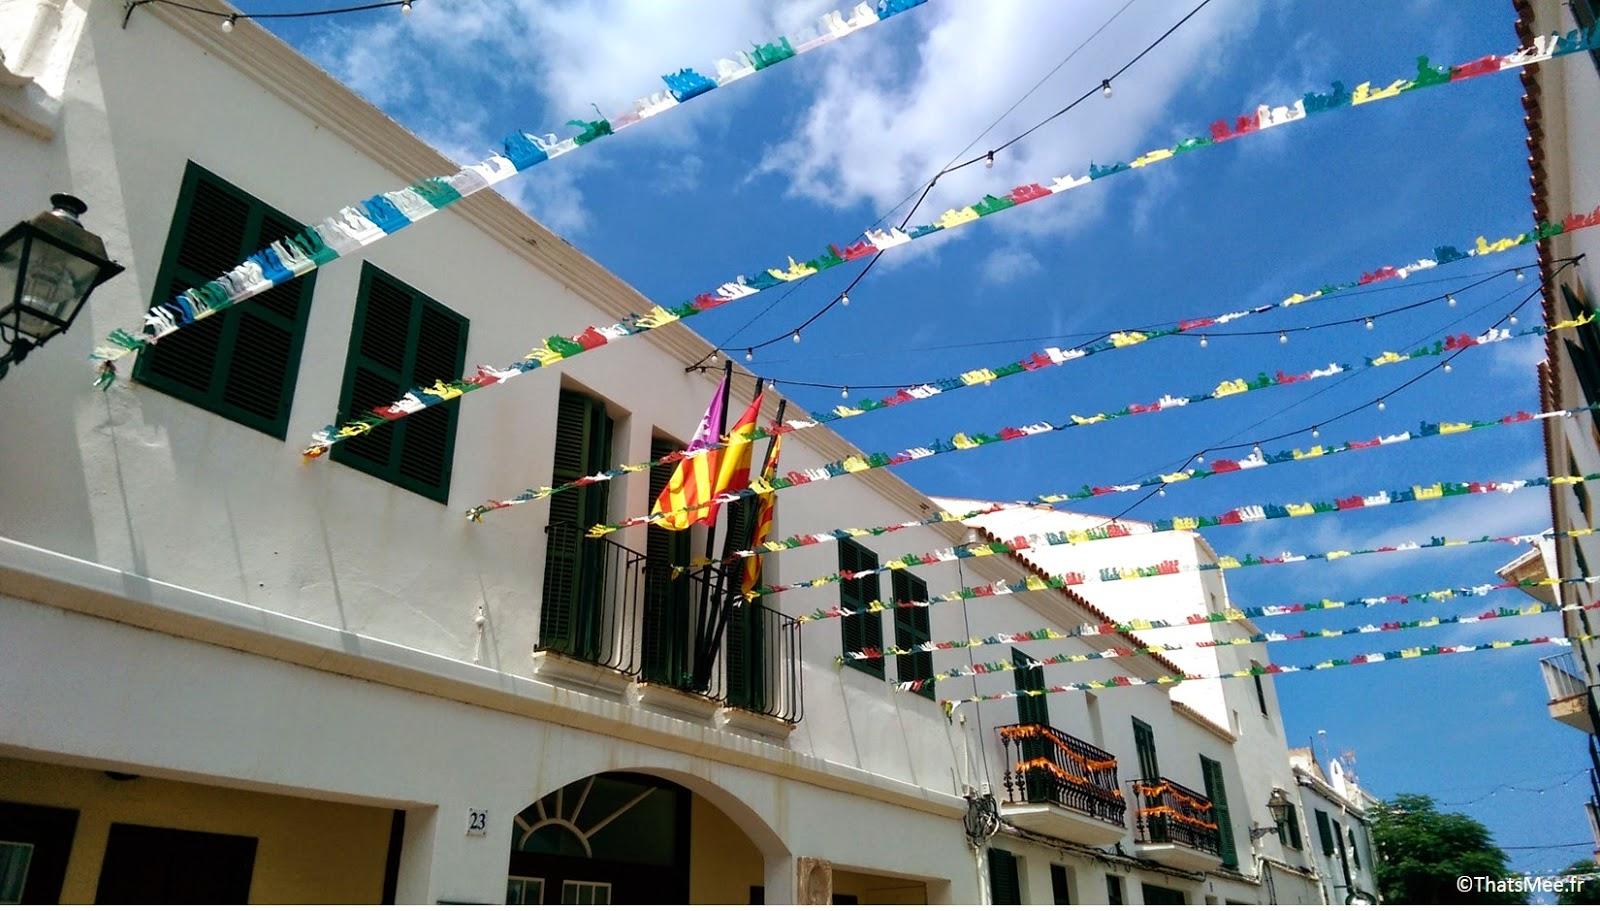 rues de Fornells Minorque Menorca calderata plat typique local